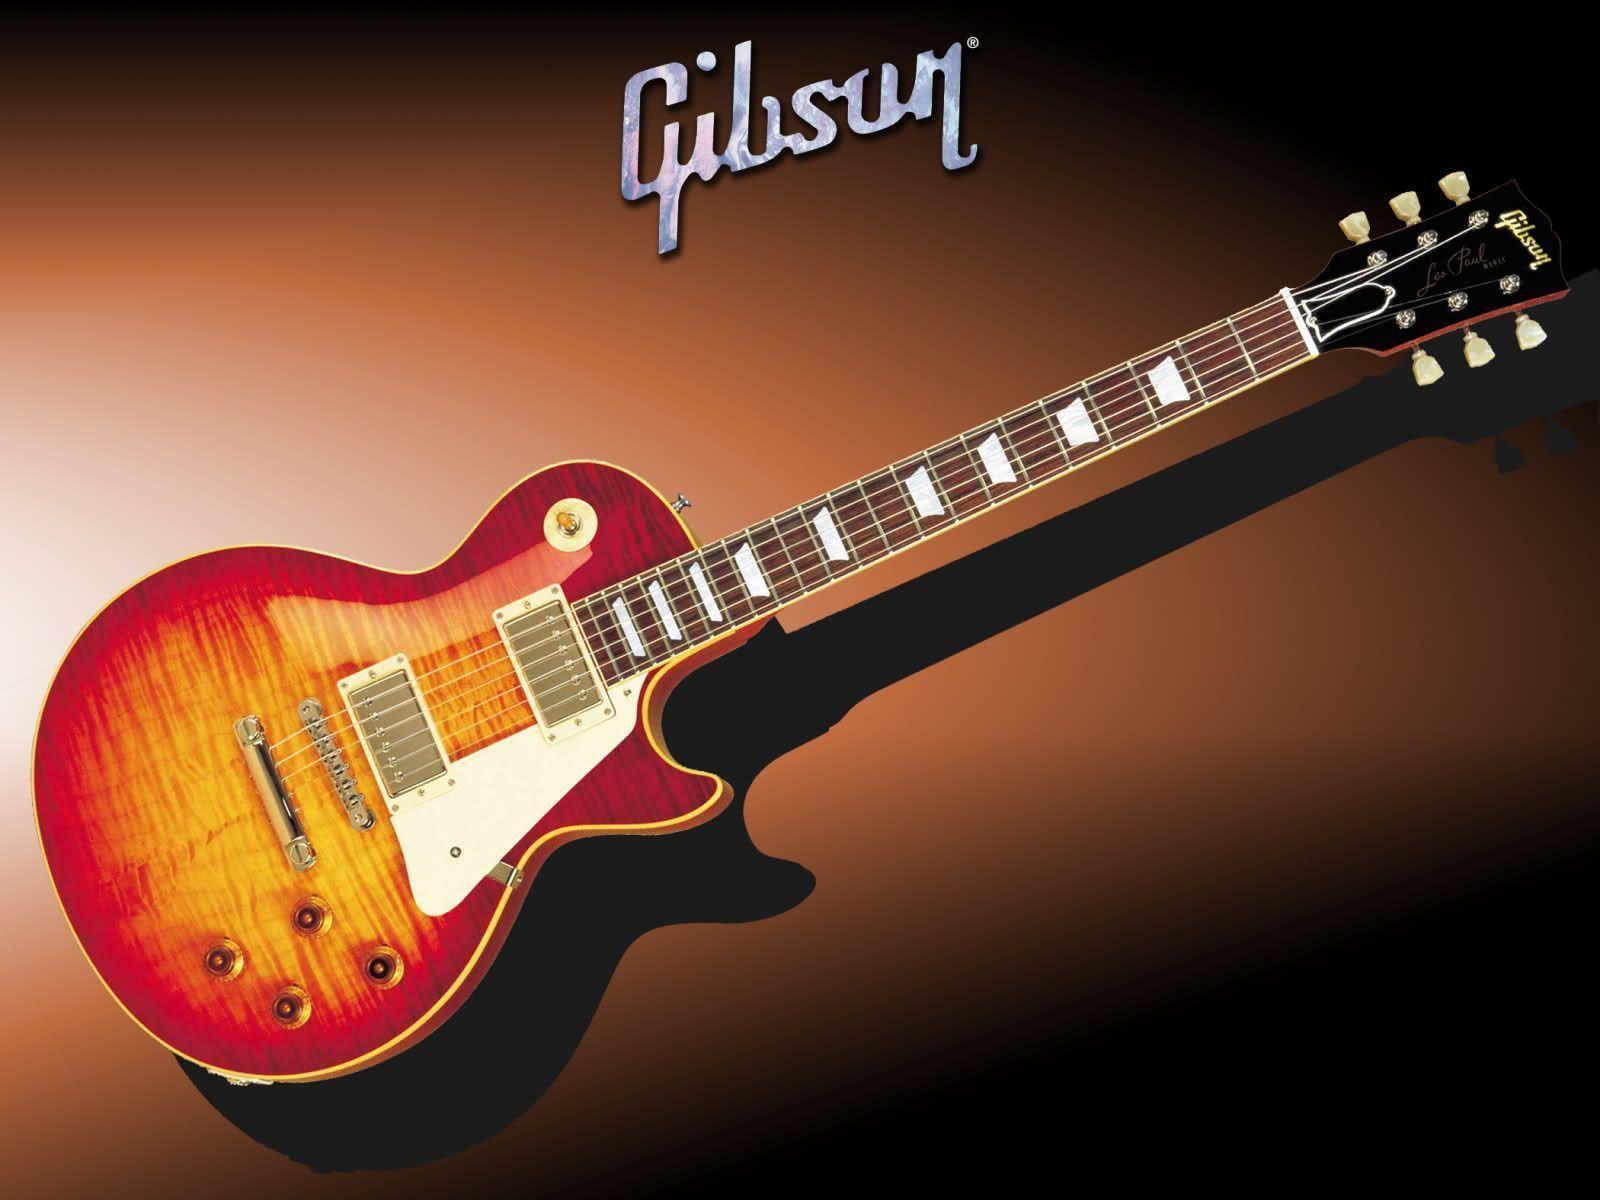 gibson guitar wallpaper - photo #5